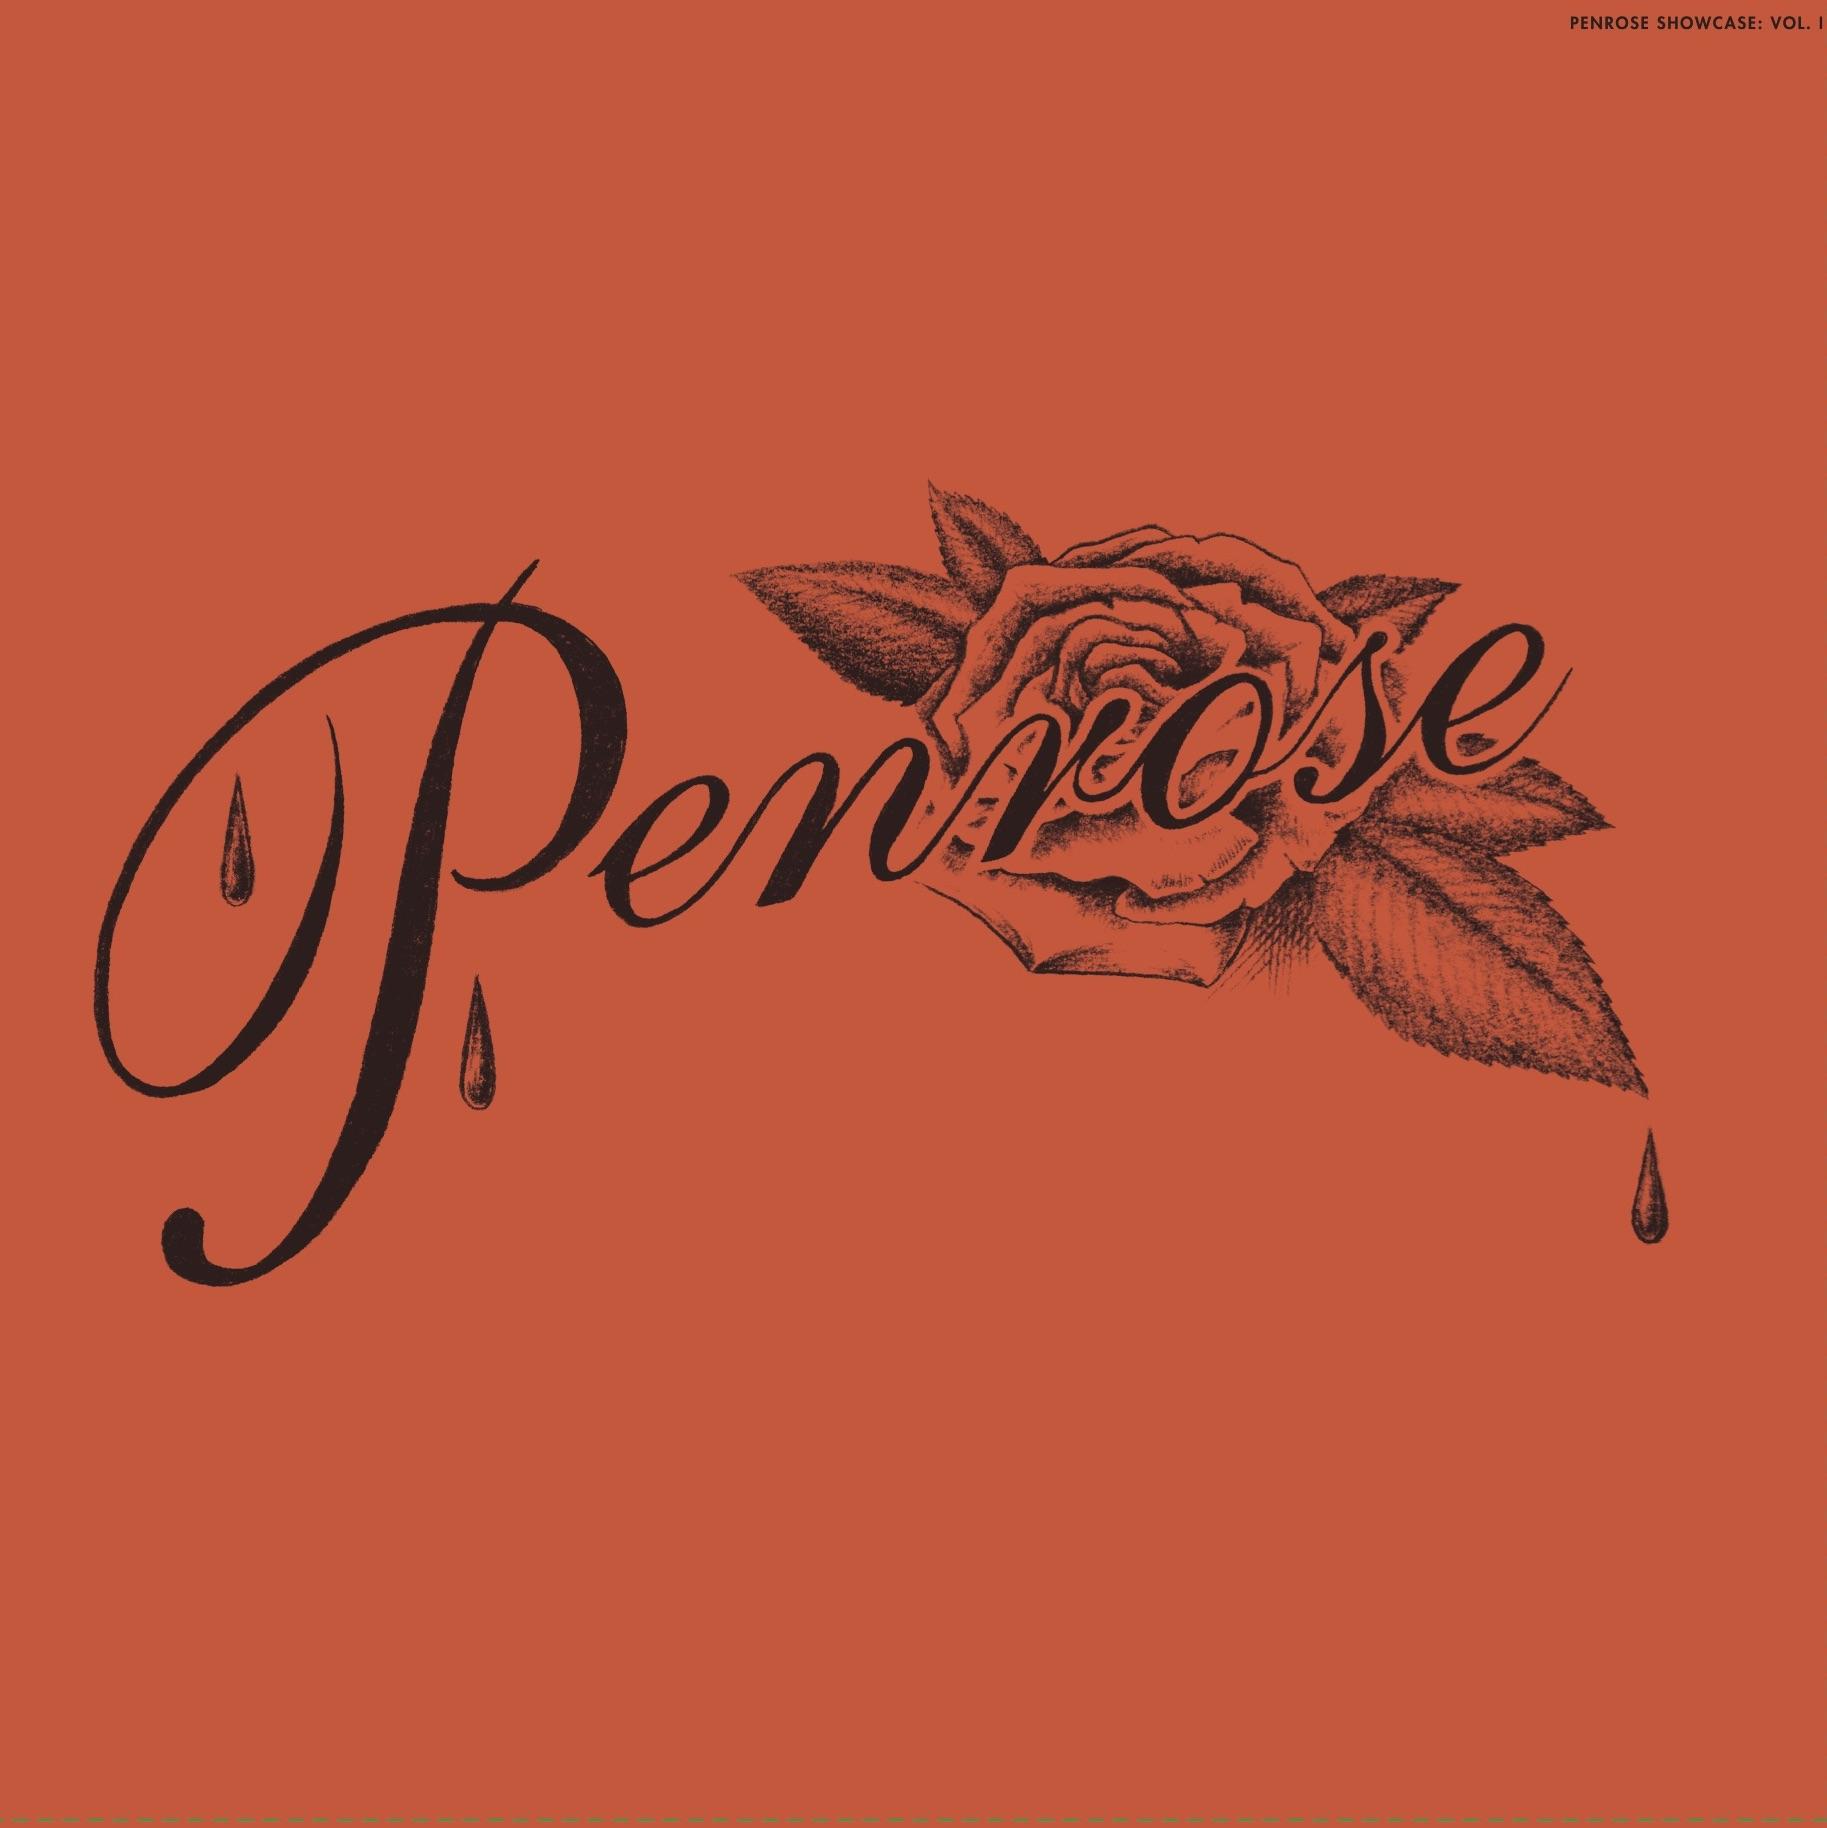 Penrose Showcase Vol.1 (clear vinyl wth slipmat)